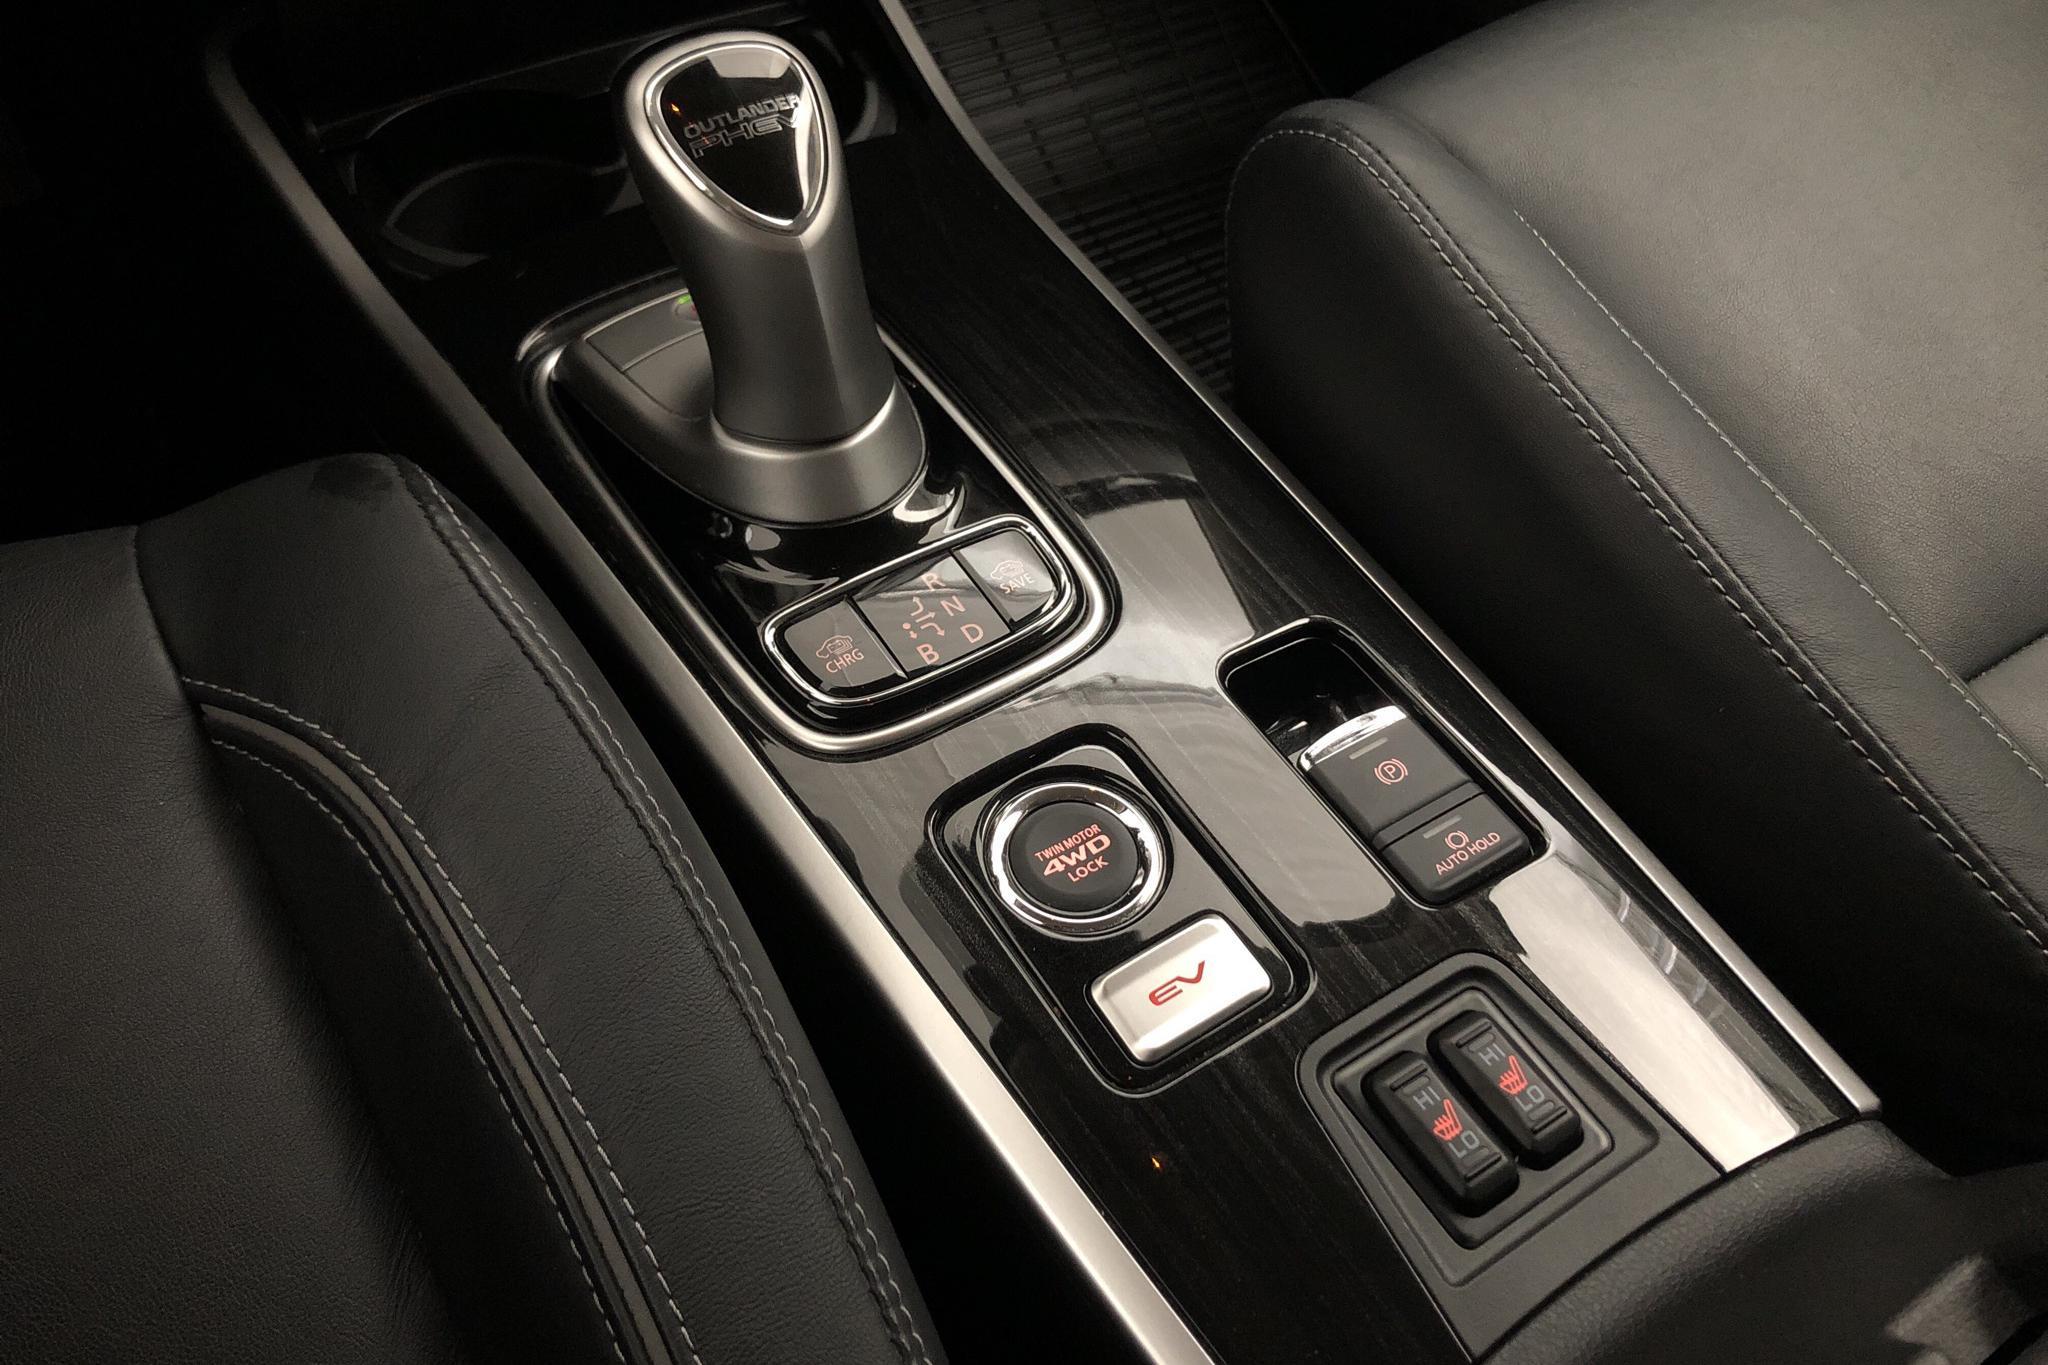 Mitsubishi Outlander 2.0 Plug-in Hybrid 4WD (121hk) - 46 670 km - Automatic - black - 2018